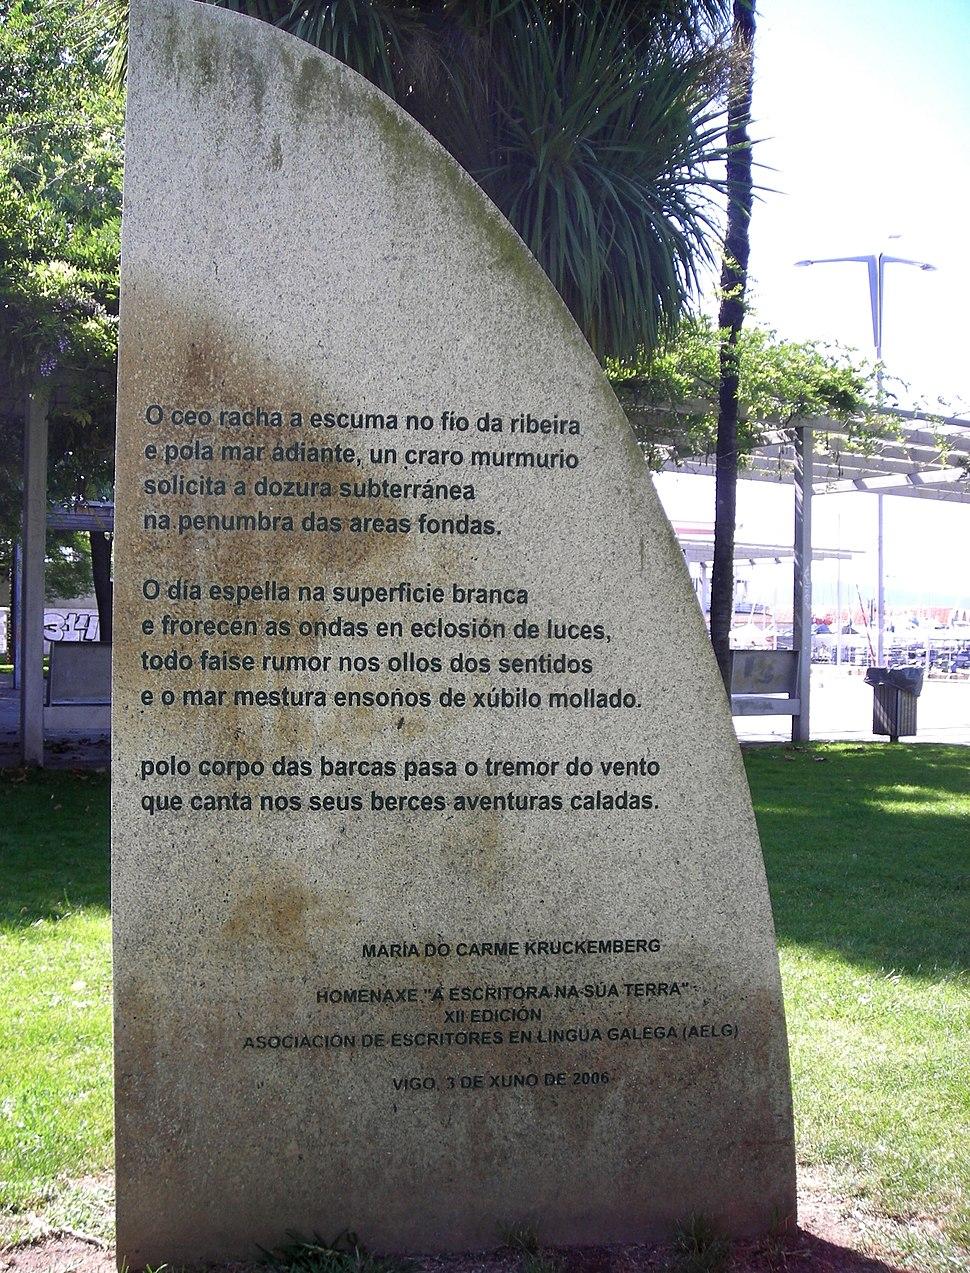 Monumento Kruckenberg Vigo